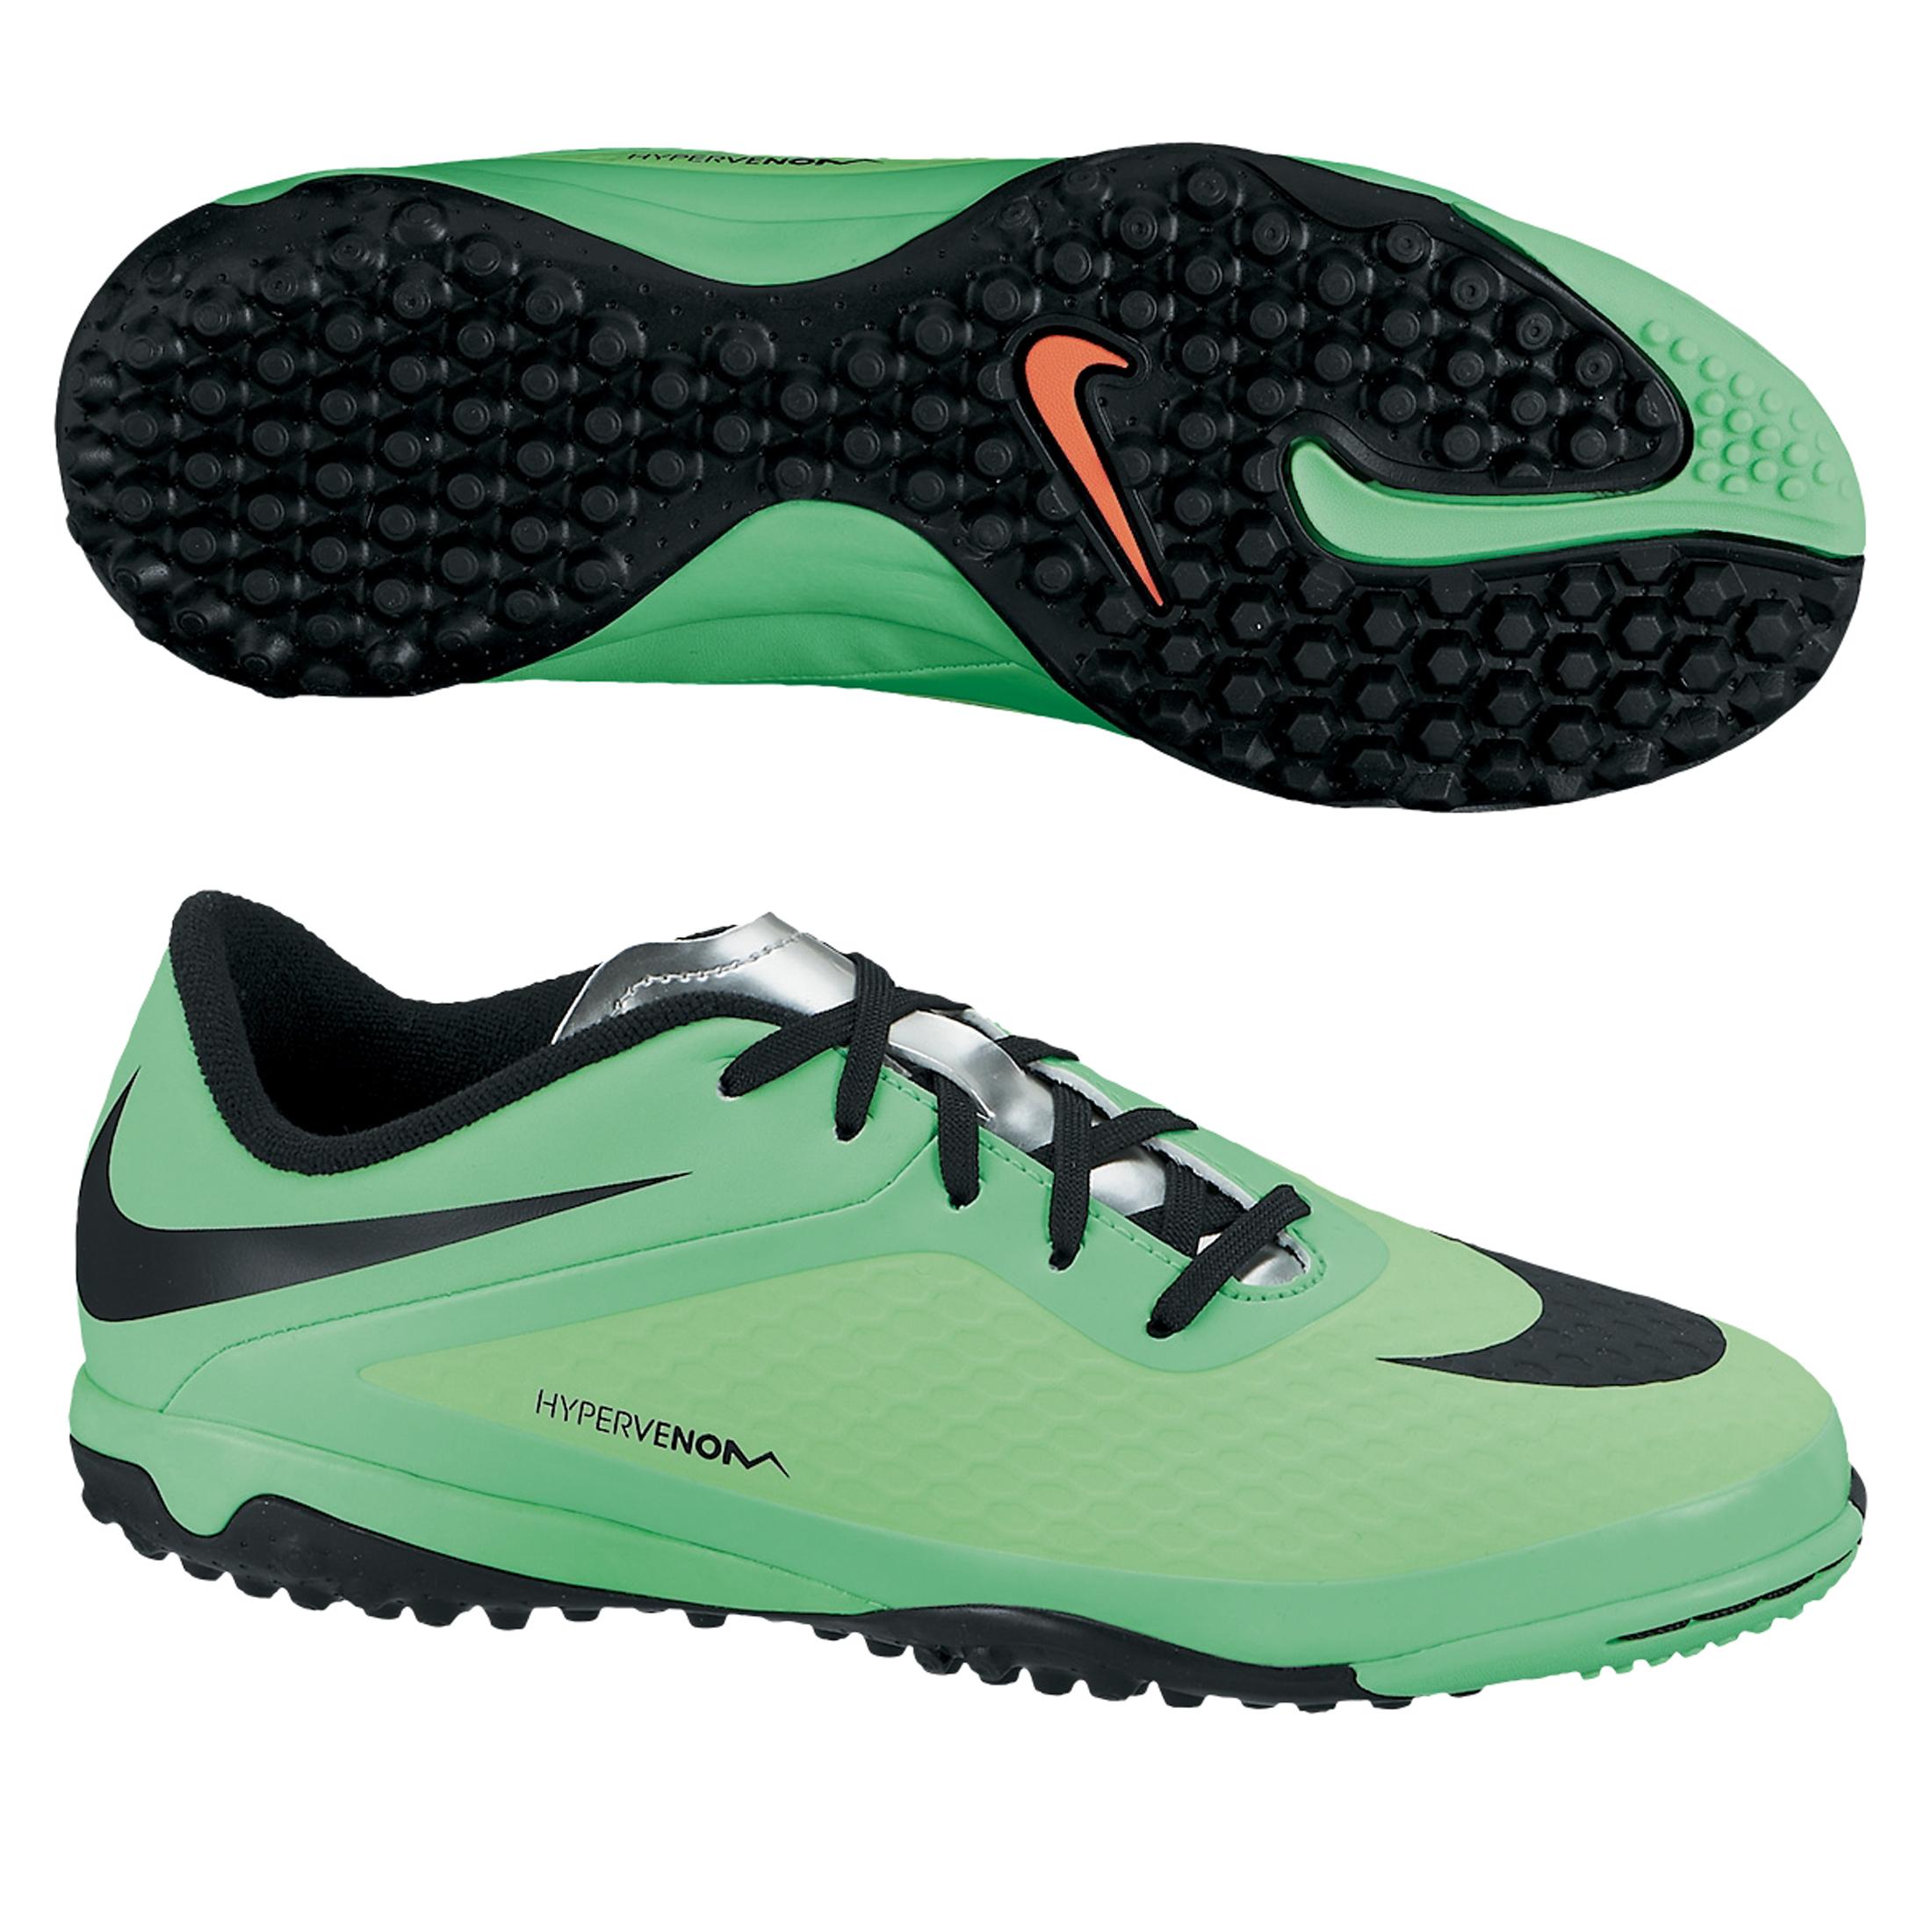 Nike Hypervenom Phelon Astroturf Trainers - Kids Green